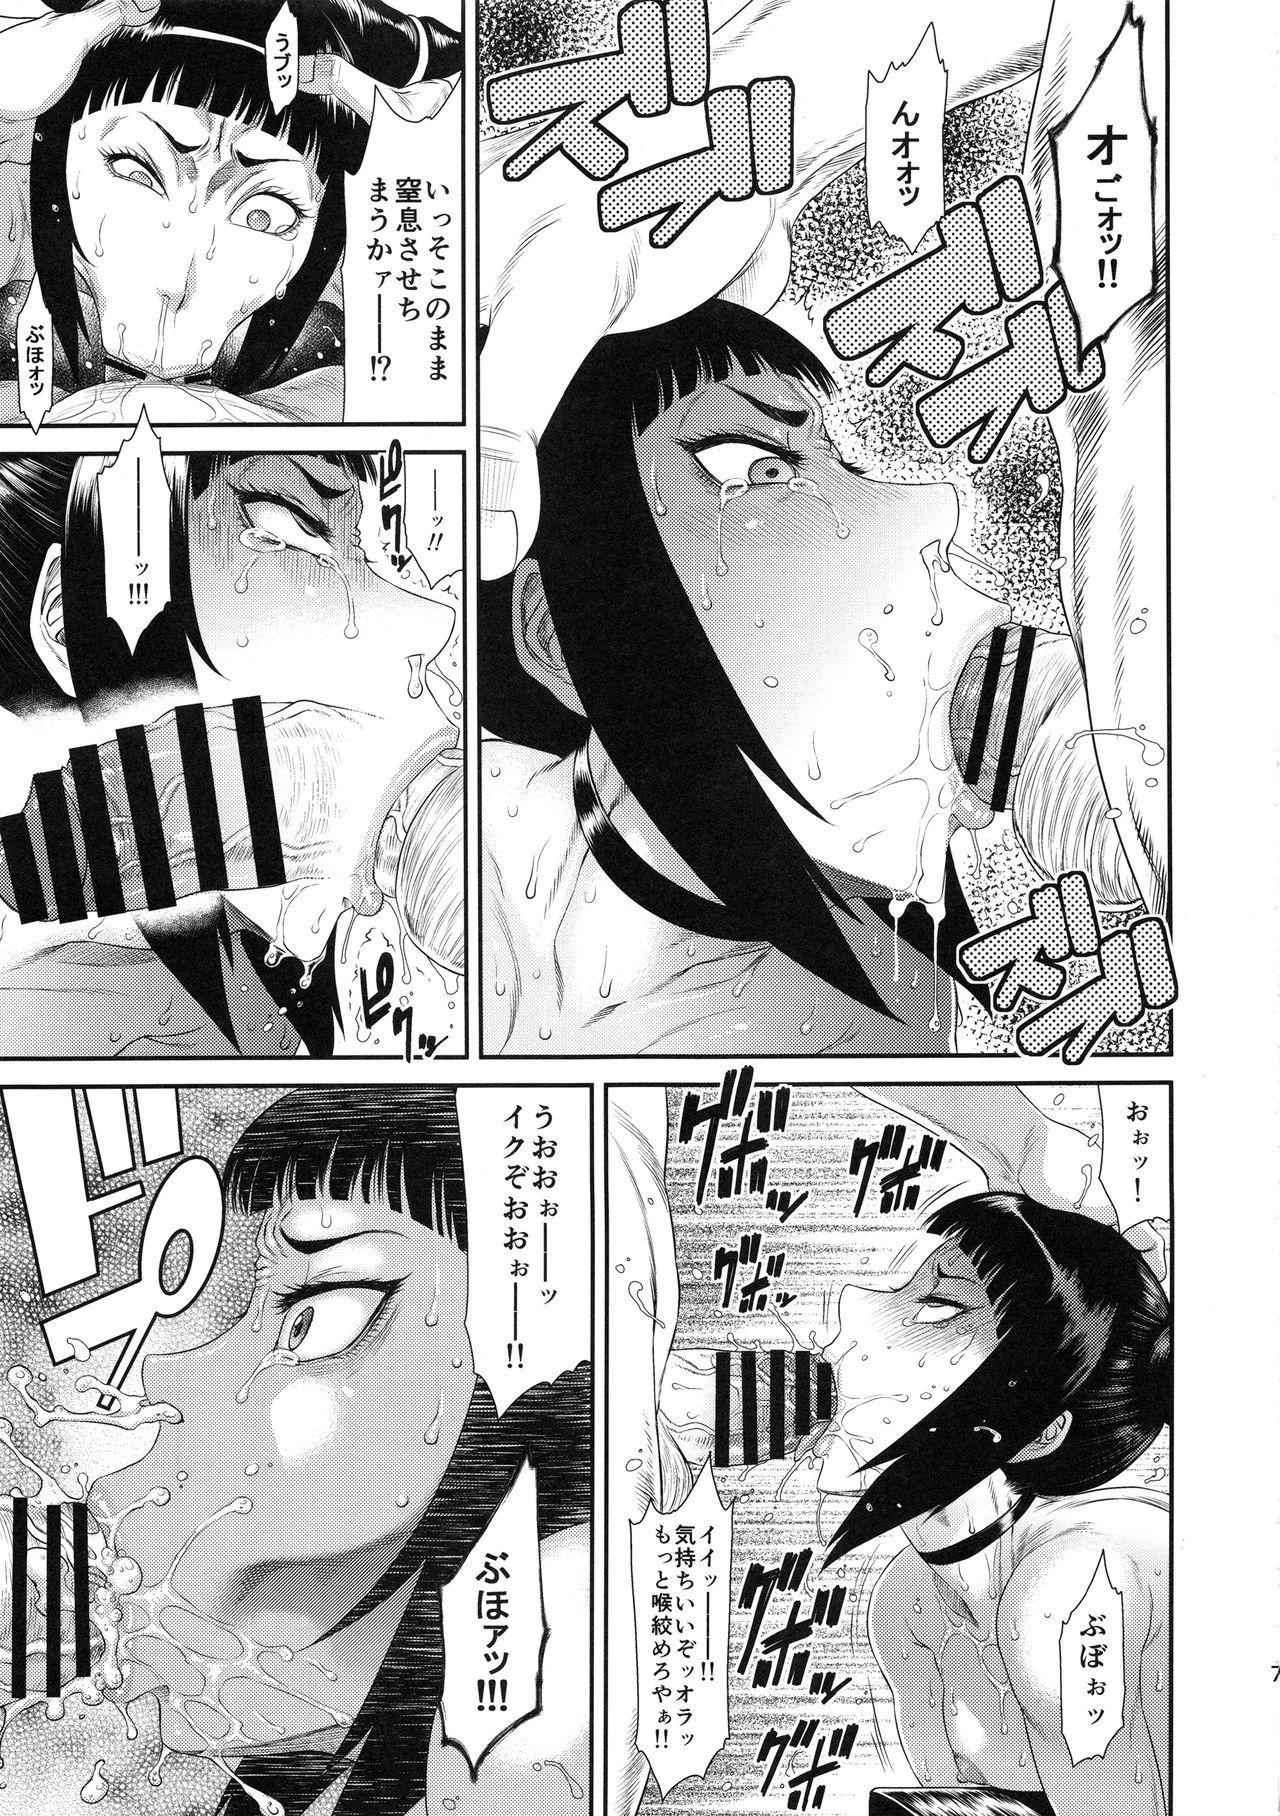 Jaaku - Wicked 5